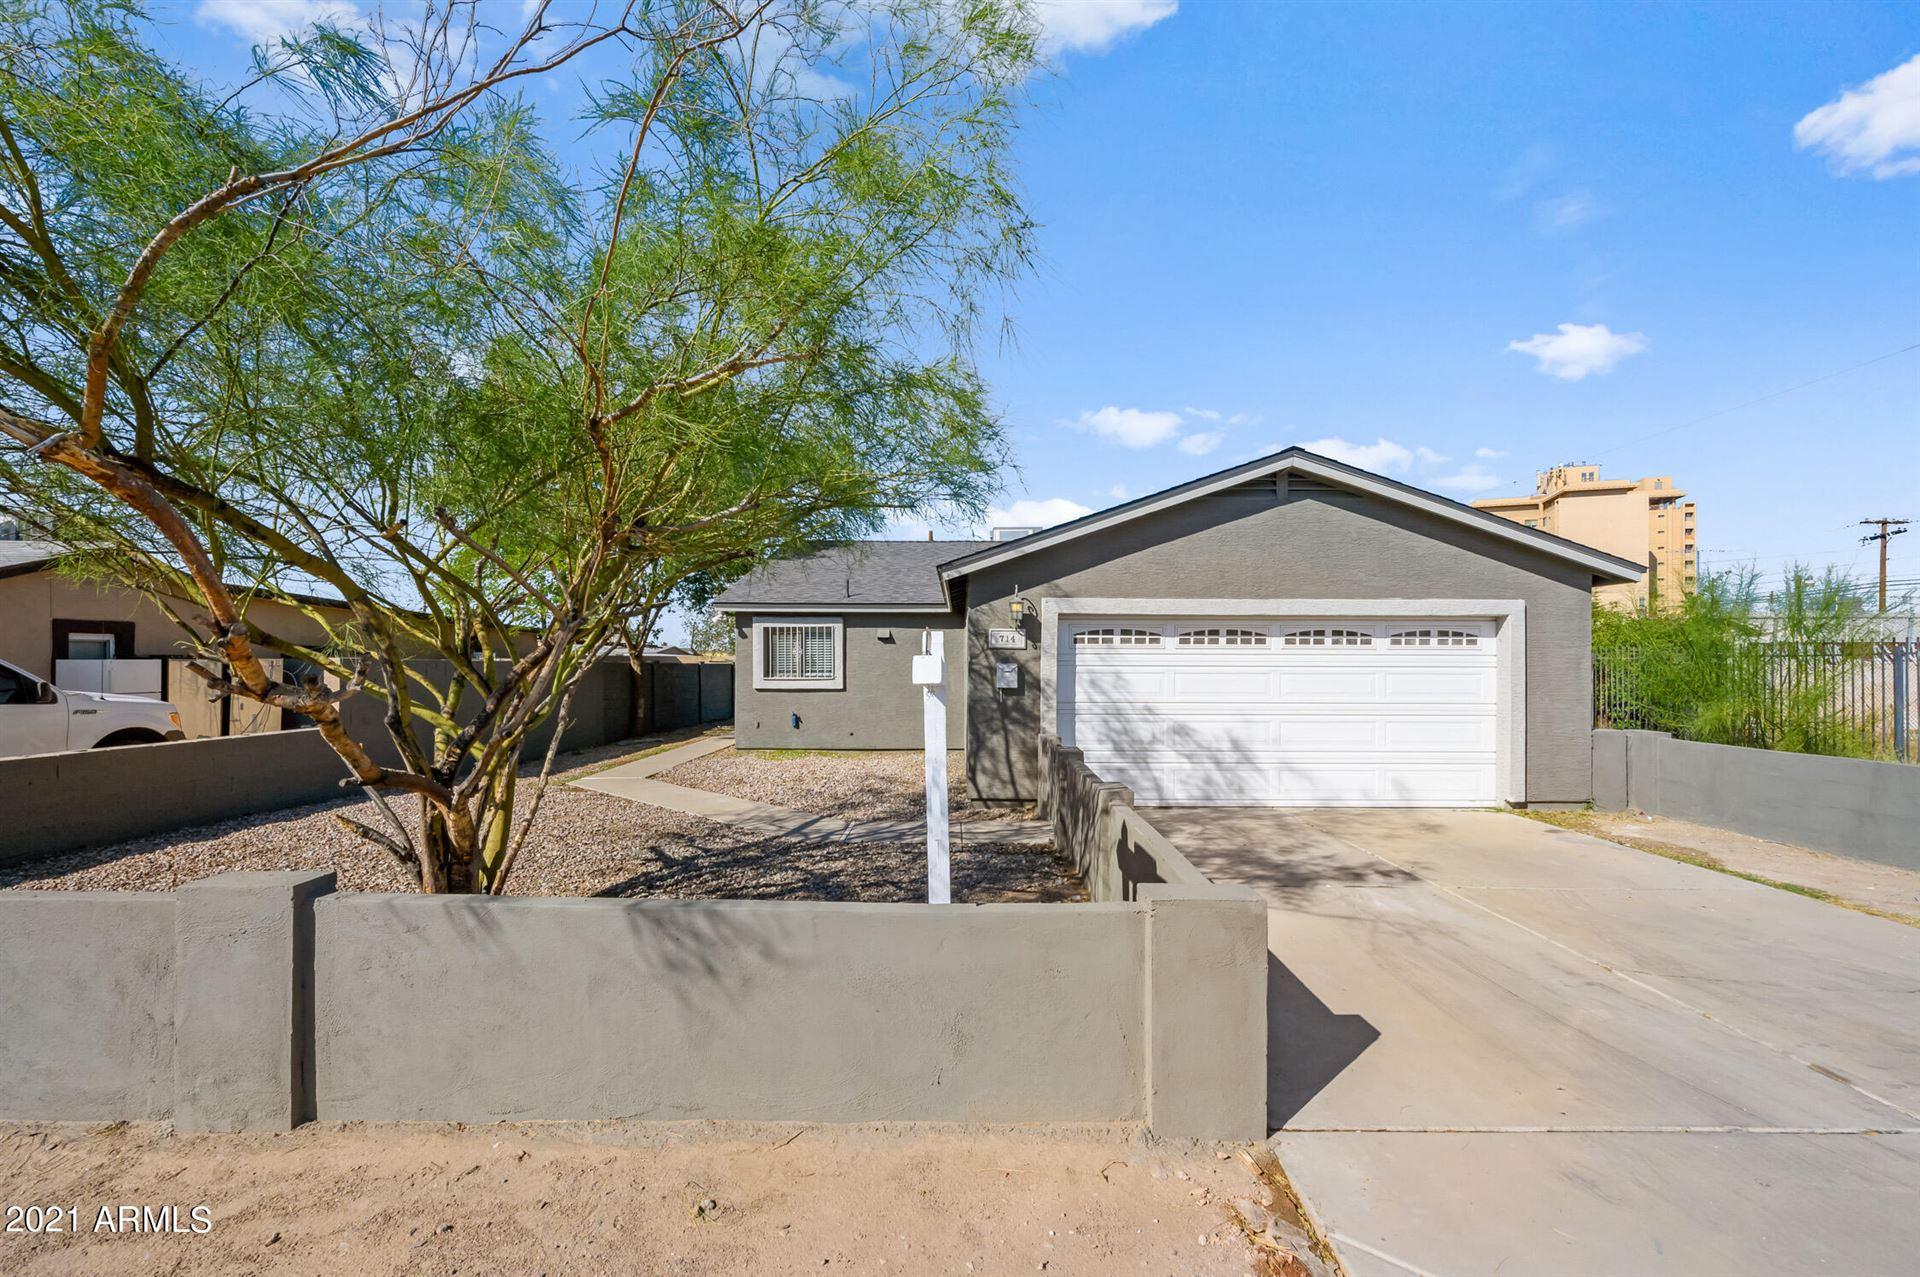 Photo of 714 W COCOPAH Street, Phoenix, AZ 85007 (MLS # 6307849)